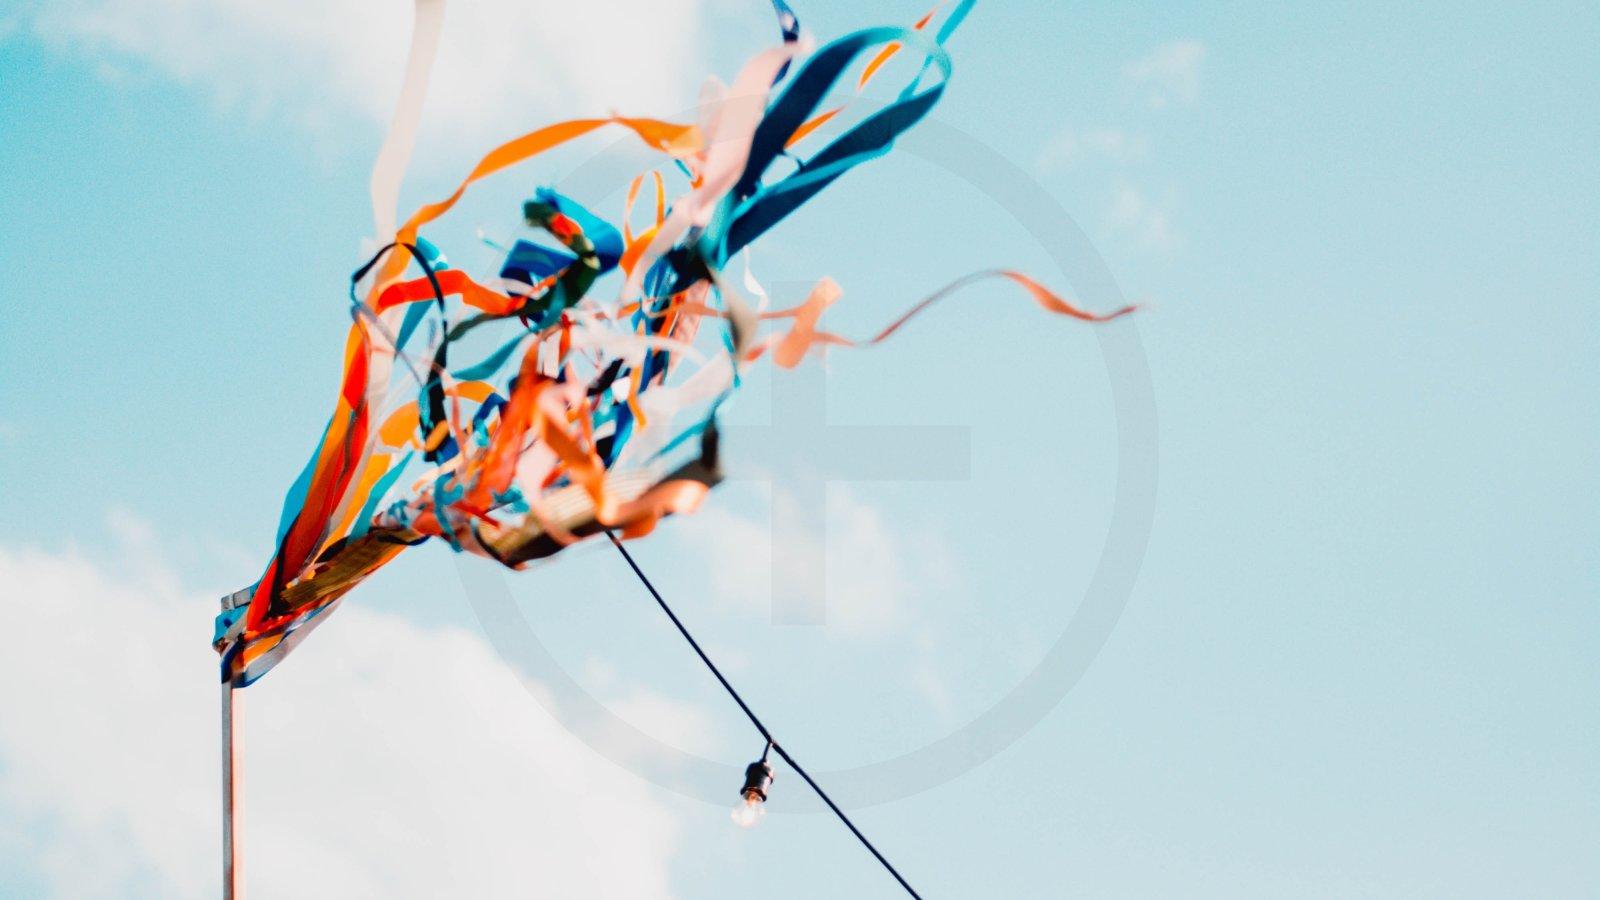 12. Juli - New Releases: Let it Flow